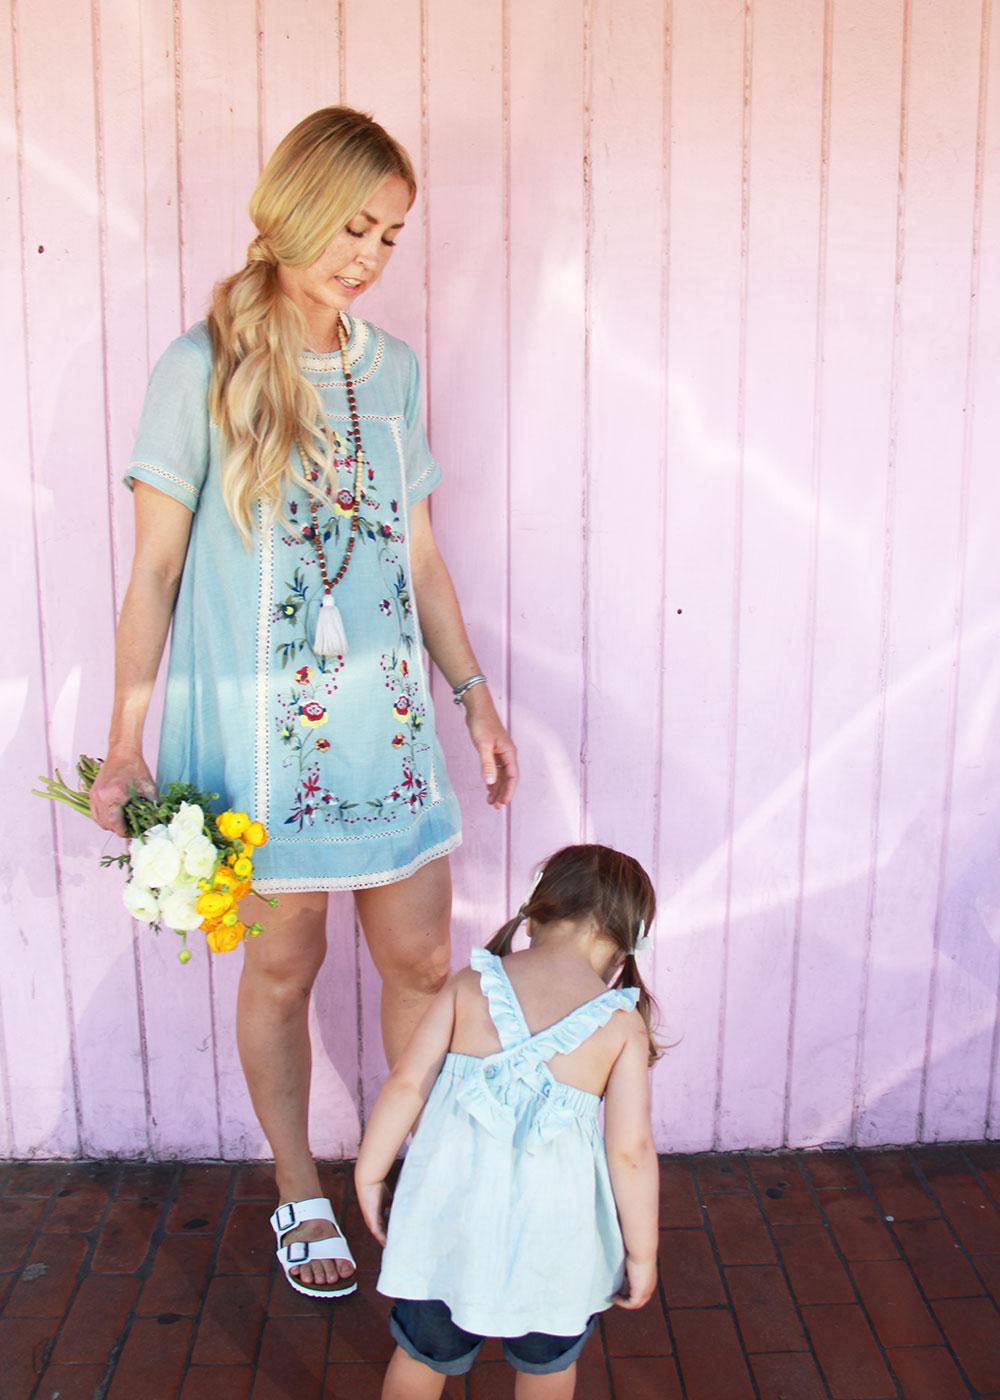 sweetest mama/daughter duo | thelovedesignedlife.com